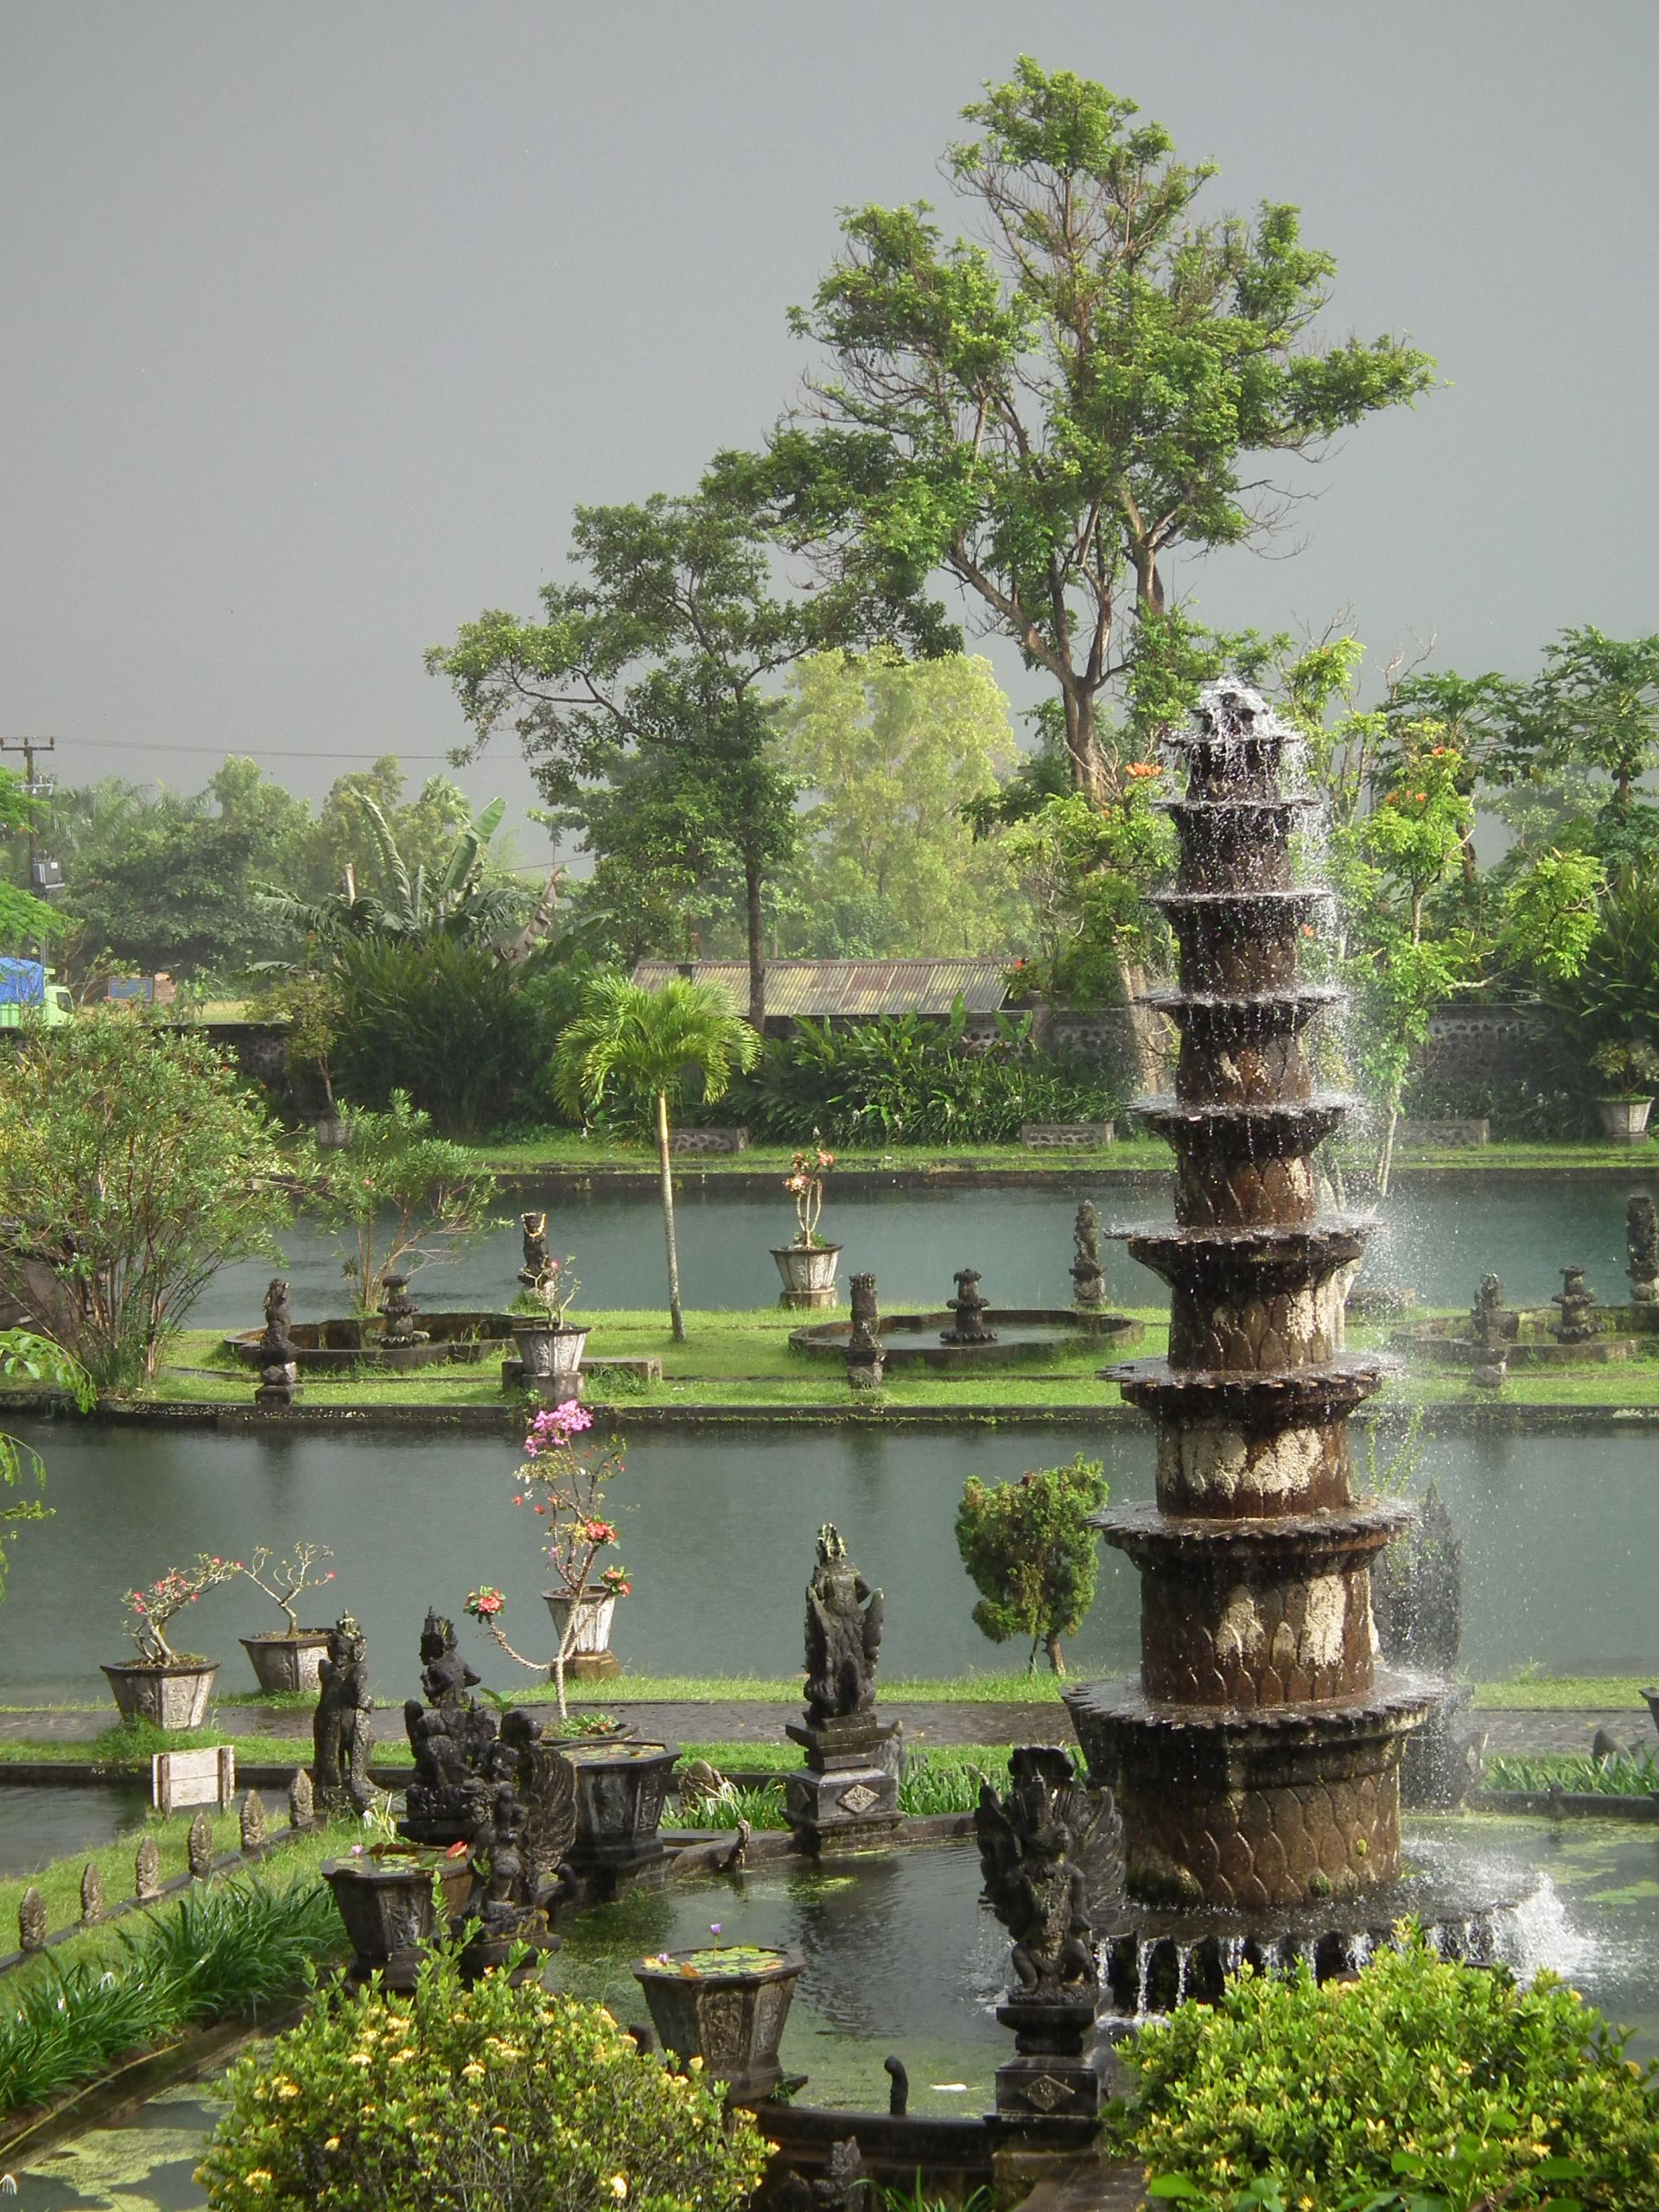 Tirta Gangga water palace Bali Indonesia JPG